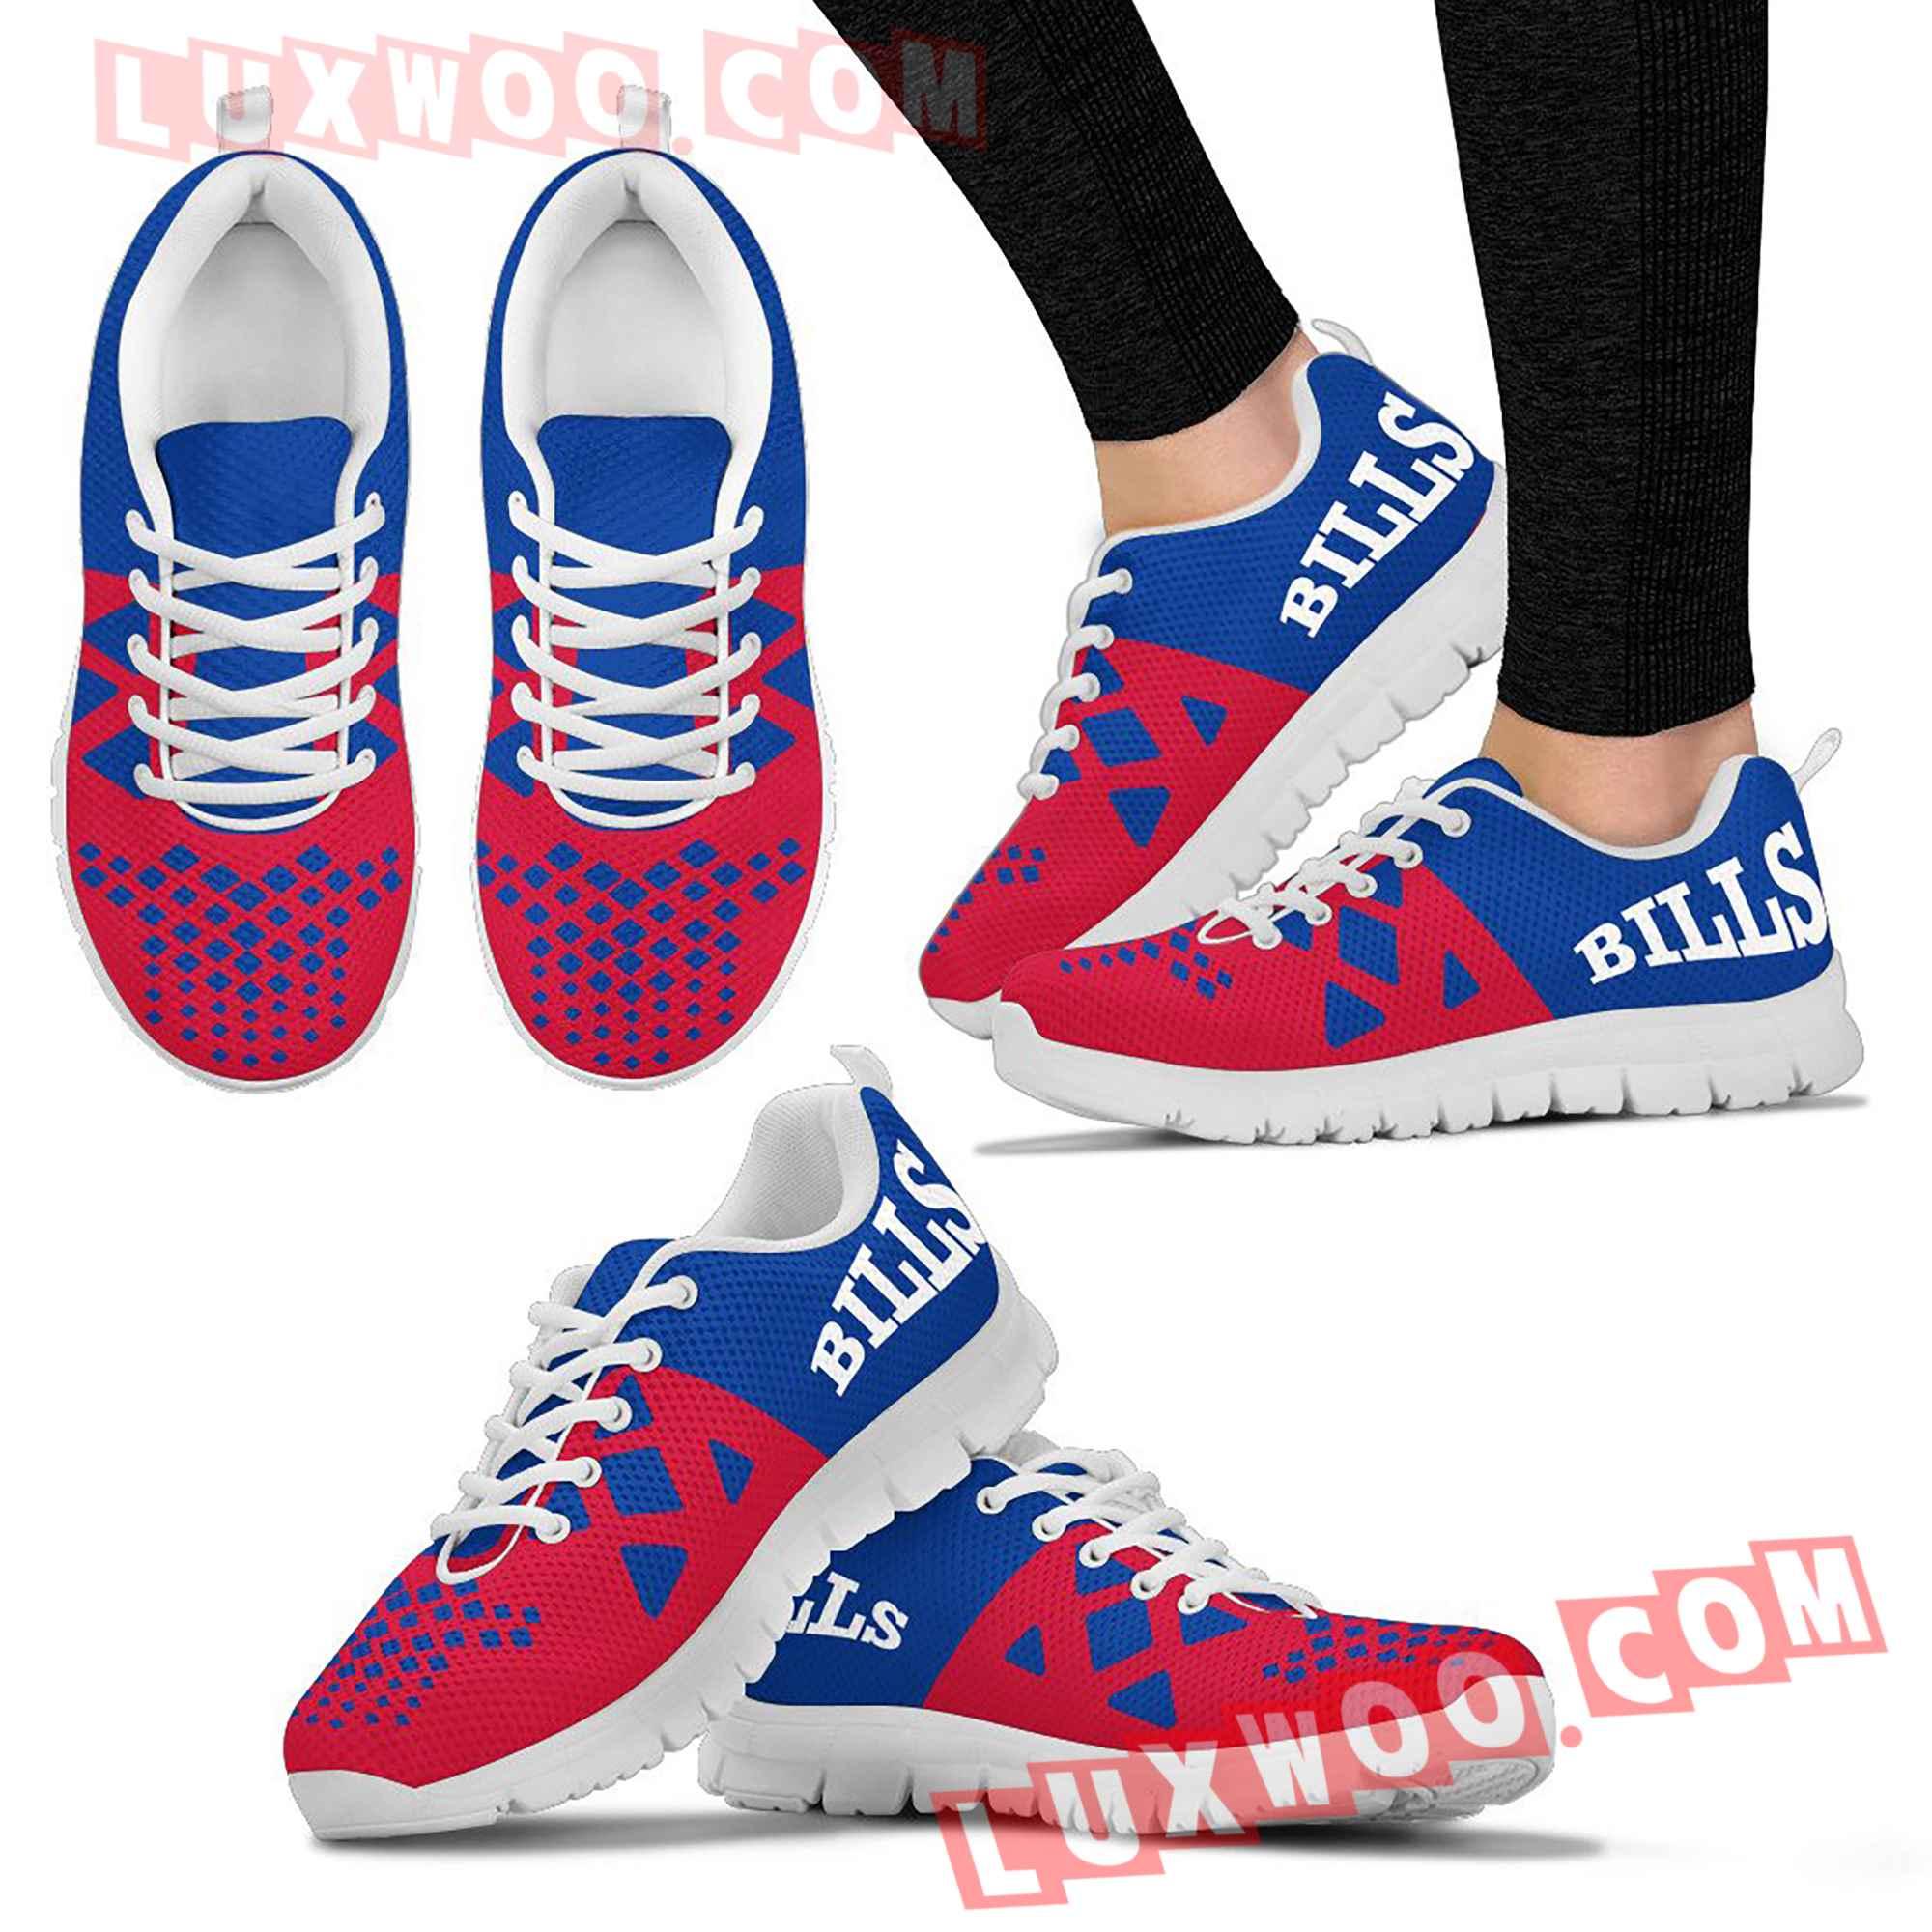 Buffalo Bills Nfl Custom Shoes Sneaker V2